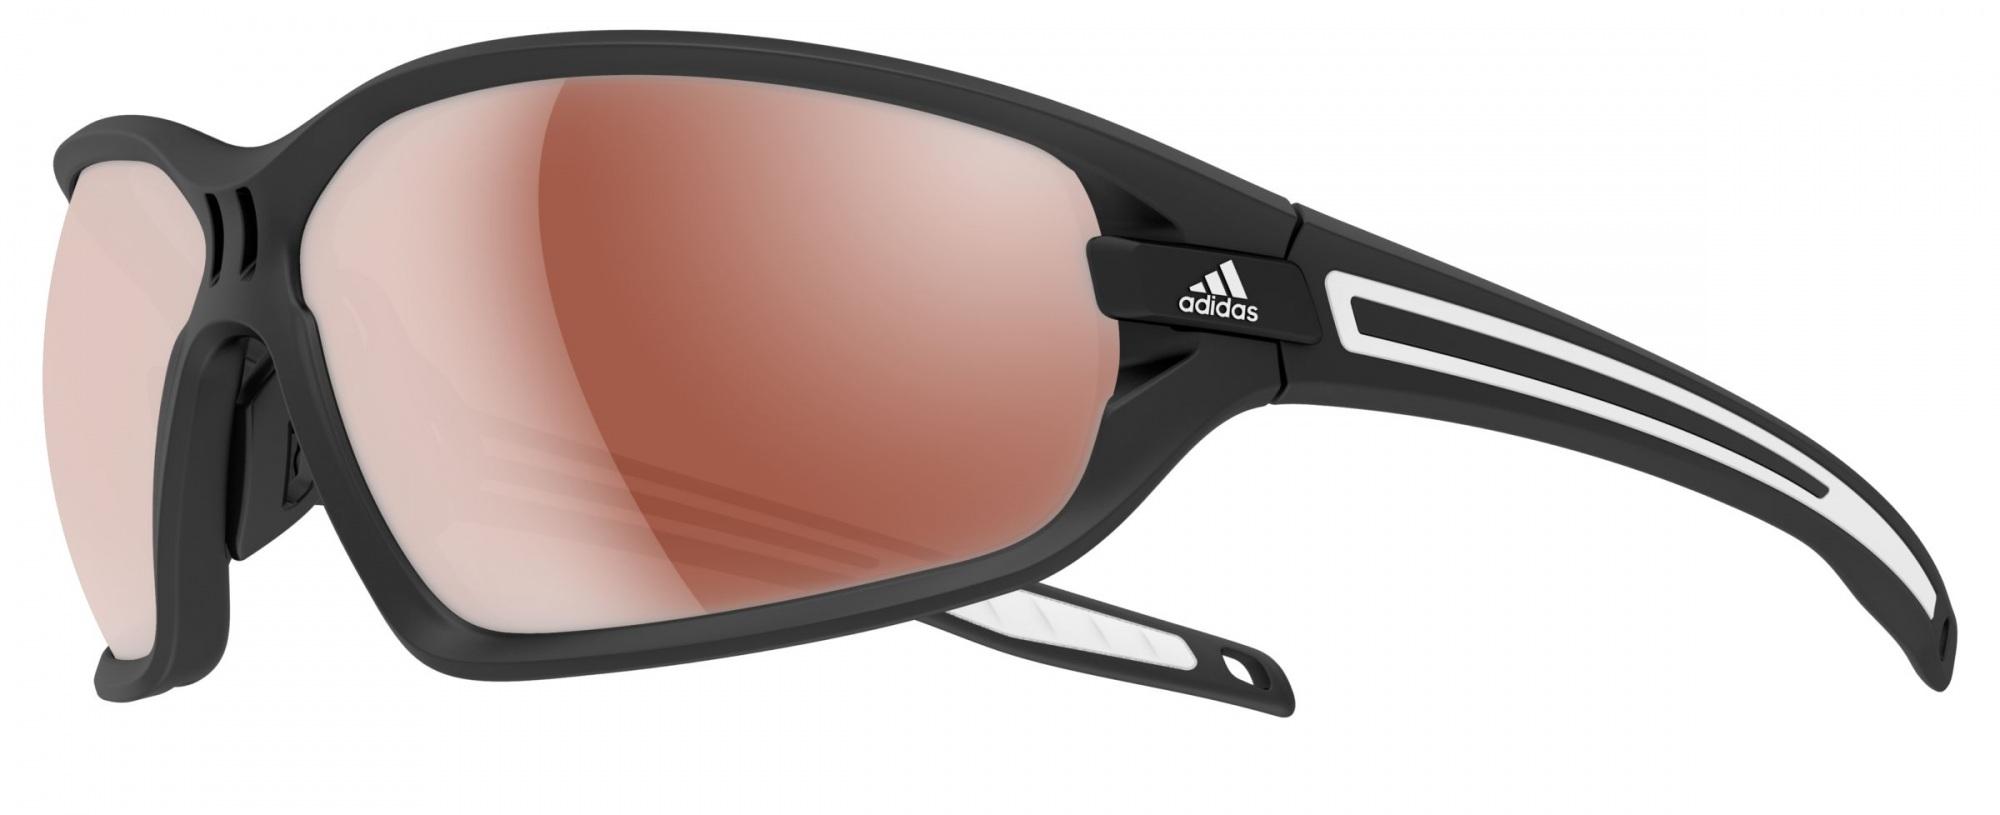 Image of   Adidas Eyewear Evil Eye Evo Solbriller - Sort mat / Sølv